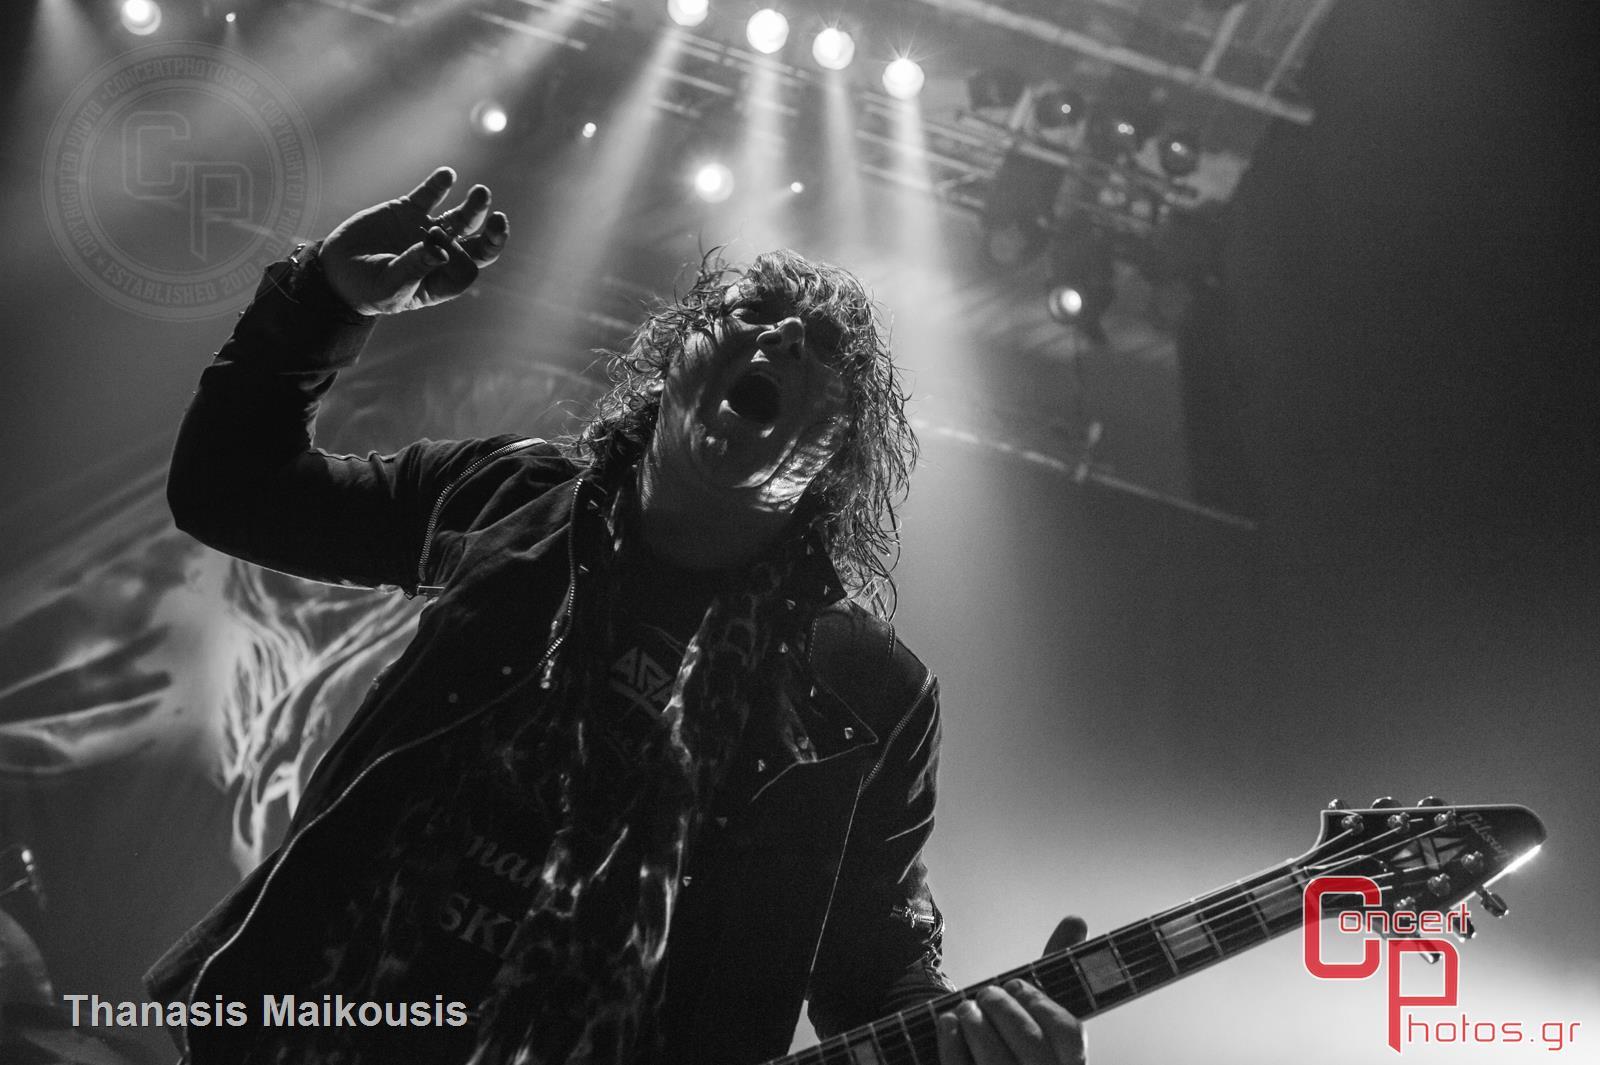 Gamma Ray + Rhapsody Of Fire-Gamma Ray Rhapsody Of Fire photographer: Thanasis Maikousis - _DSC1390